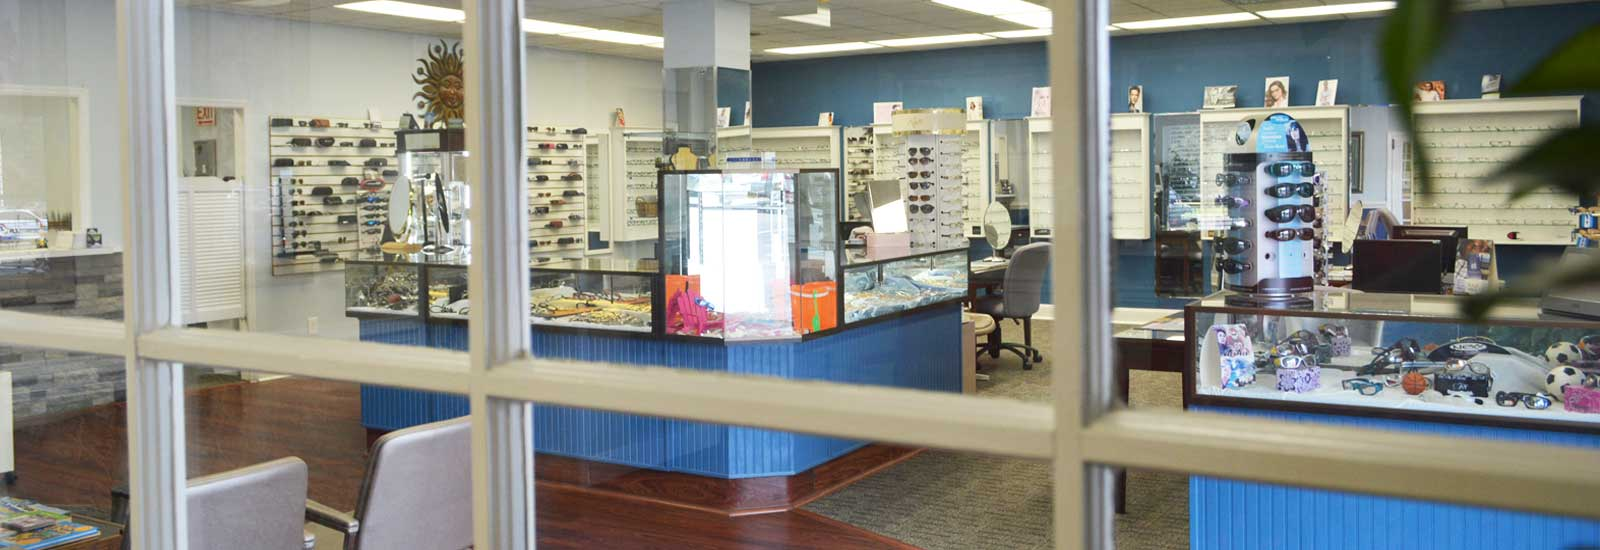 Local Opticians NC Best Eyeglasses